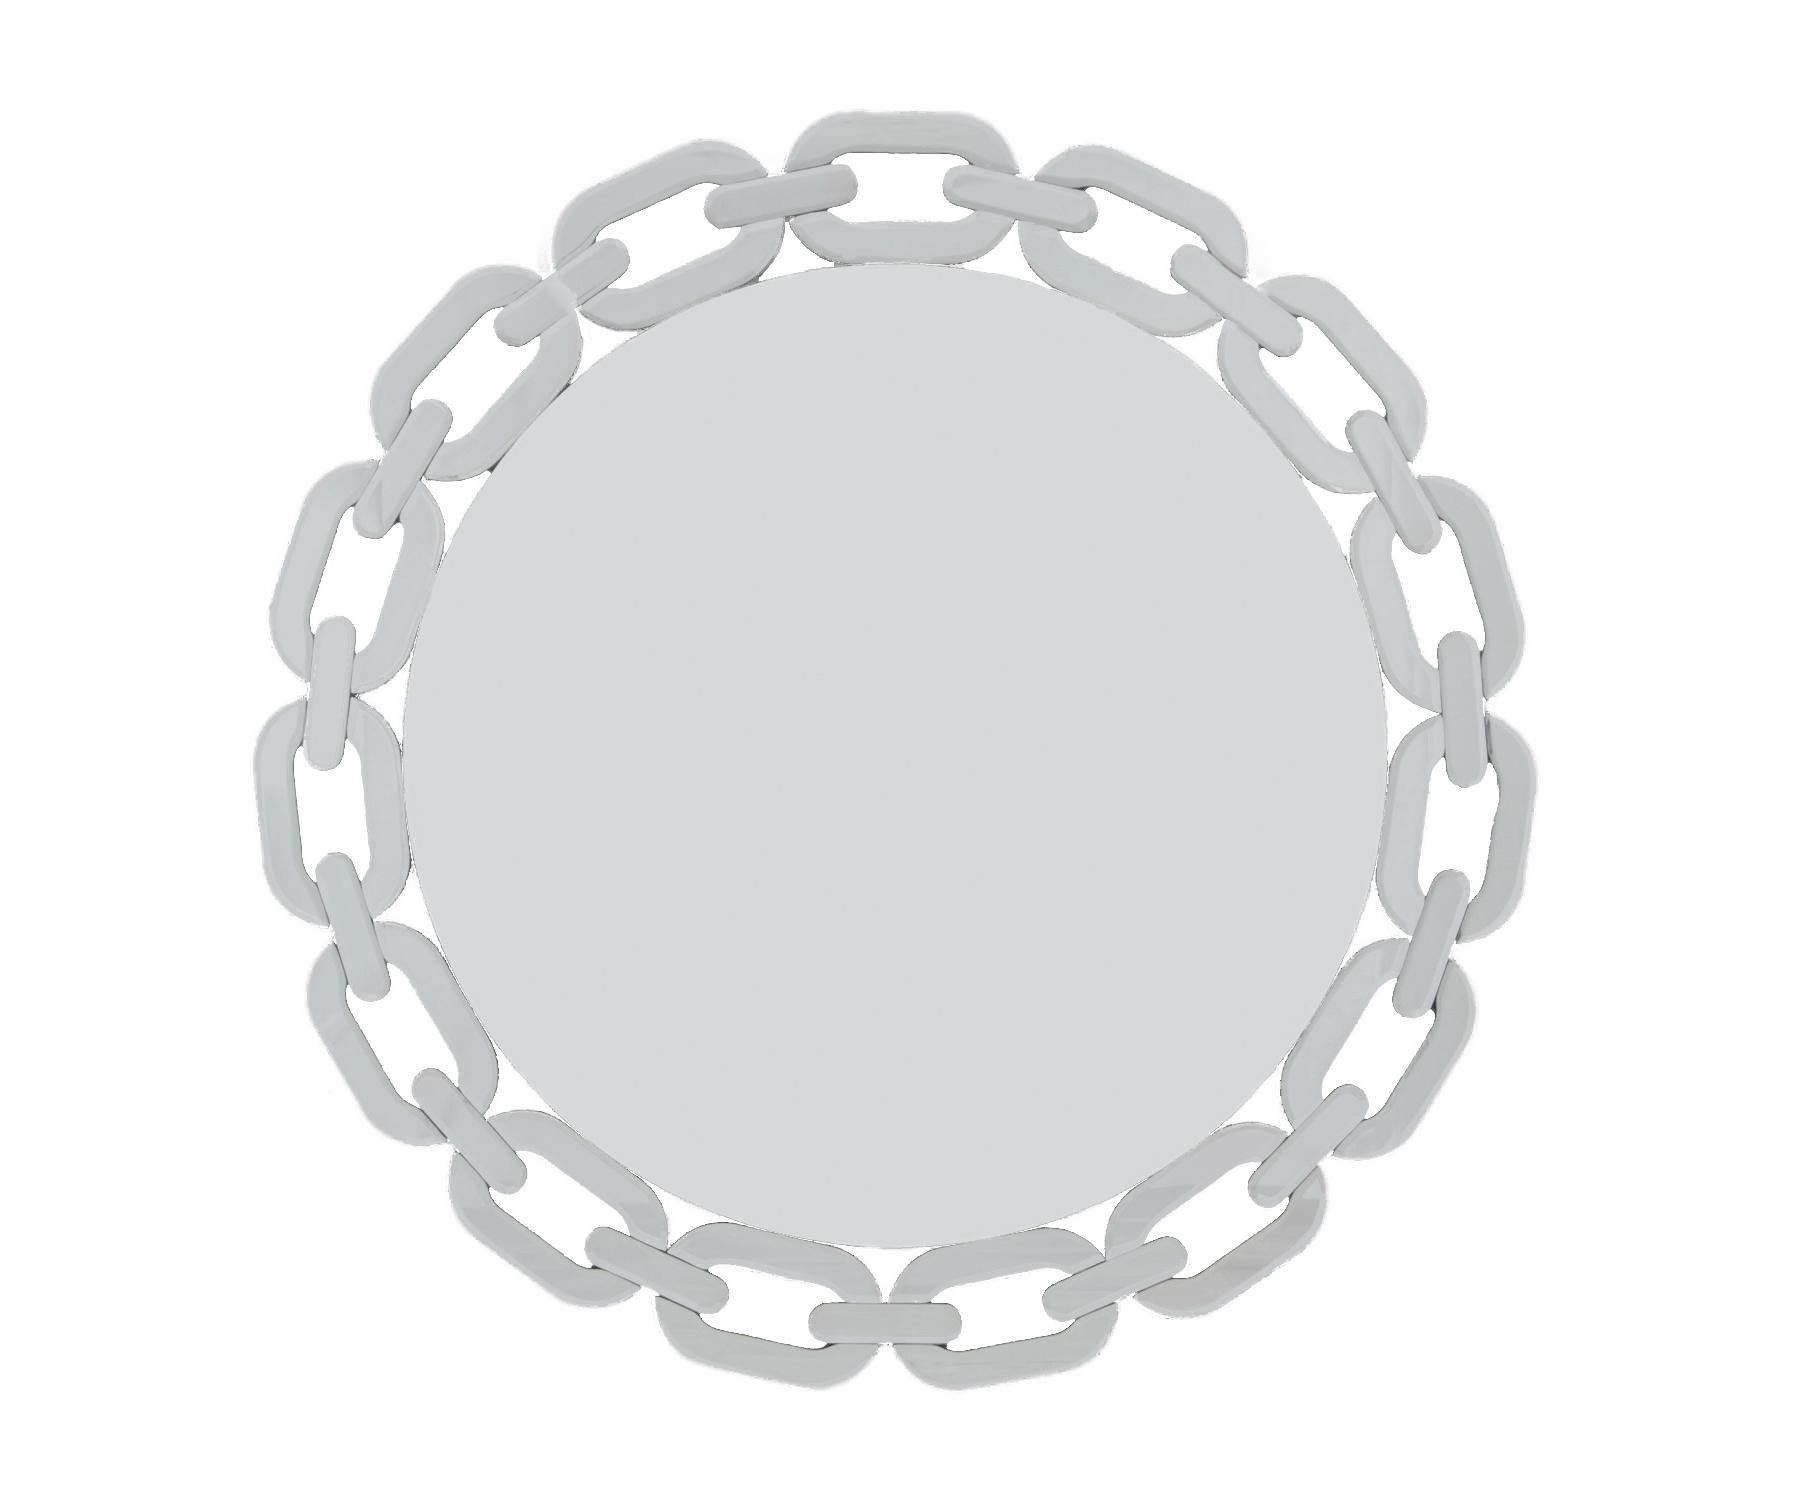 Зеркало NovaНастенные зеркала<br><br><br>Material: Металл<br>Глубина см: 1